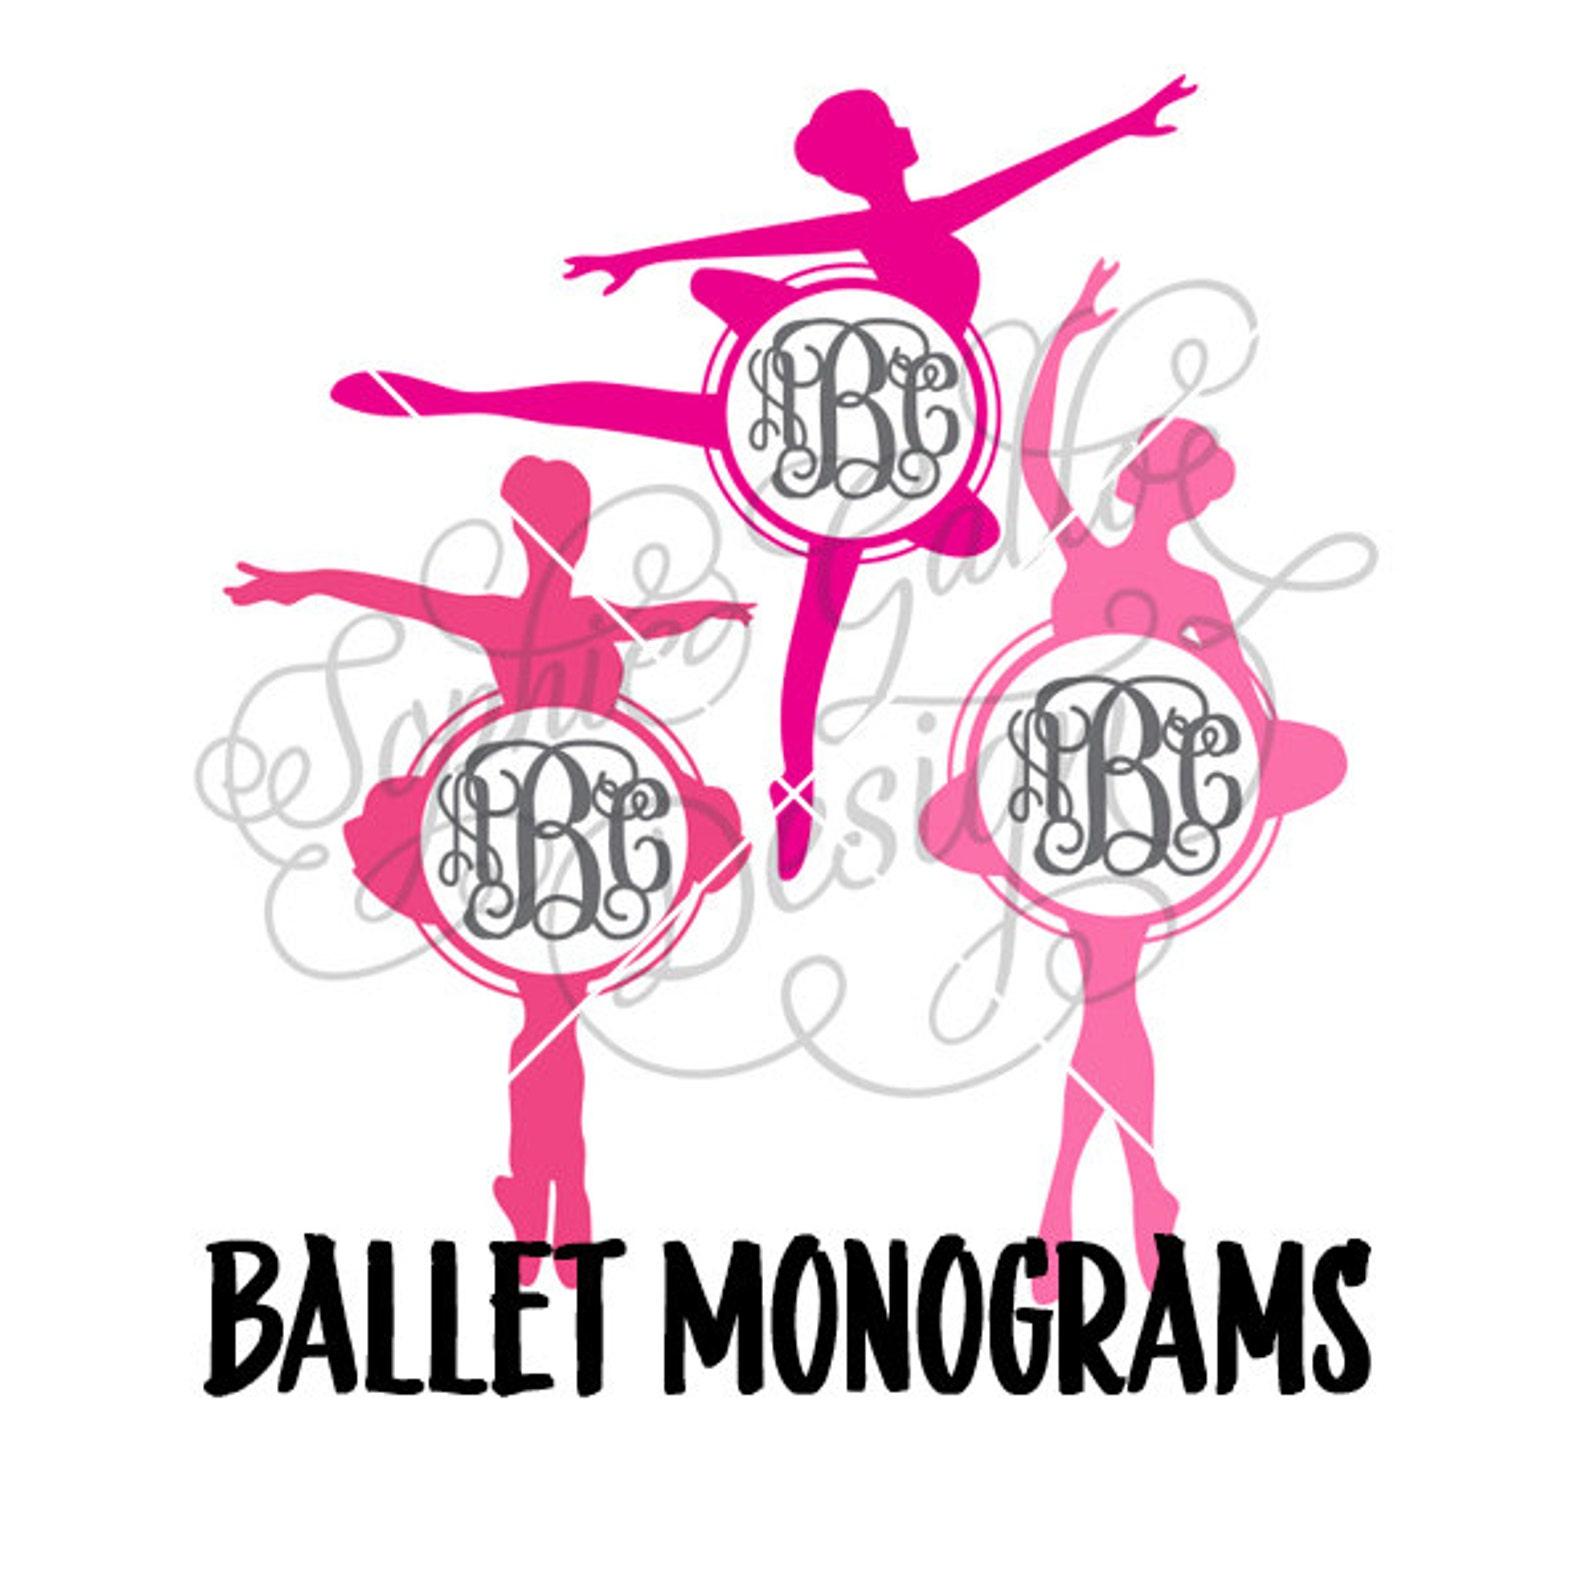 ballet monograms svg dxf digital download files for silhouette cricut vector clip art graphics vinyl cutting machine, screen pri